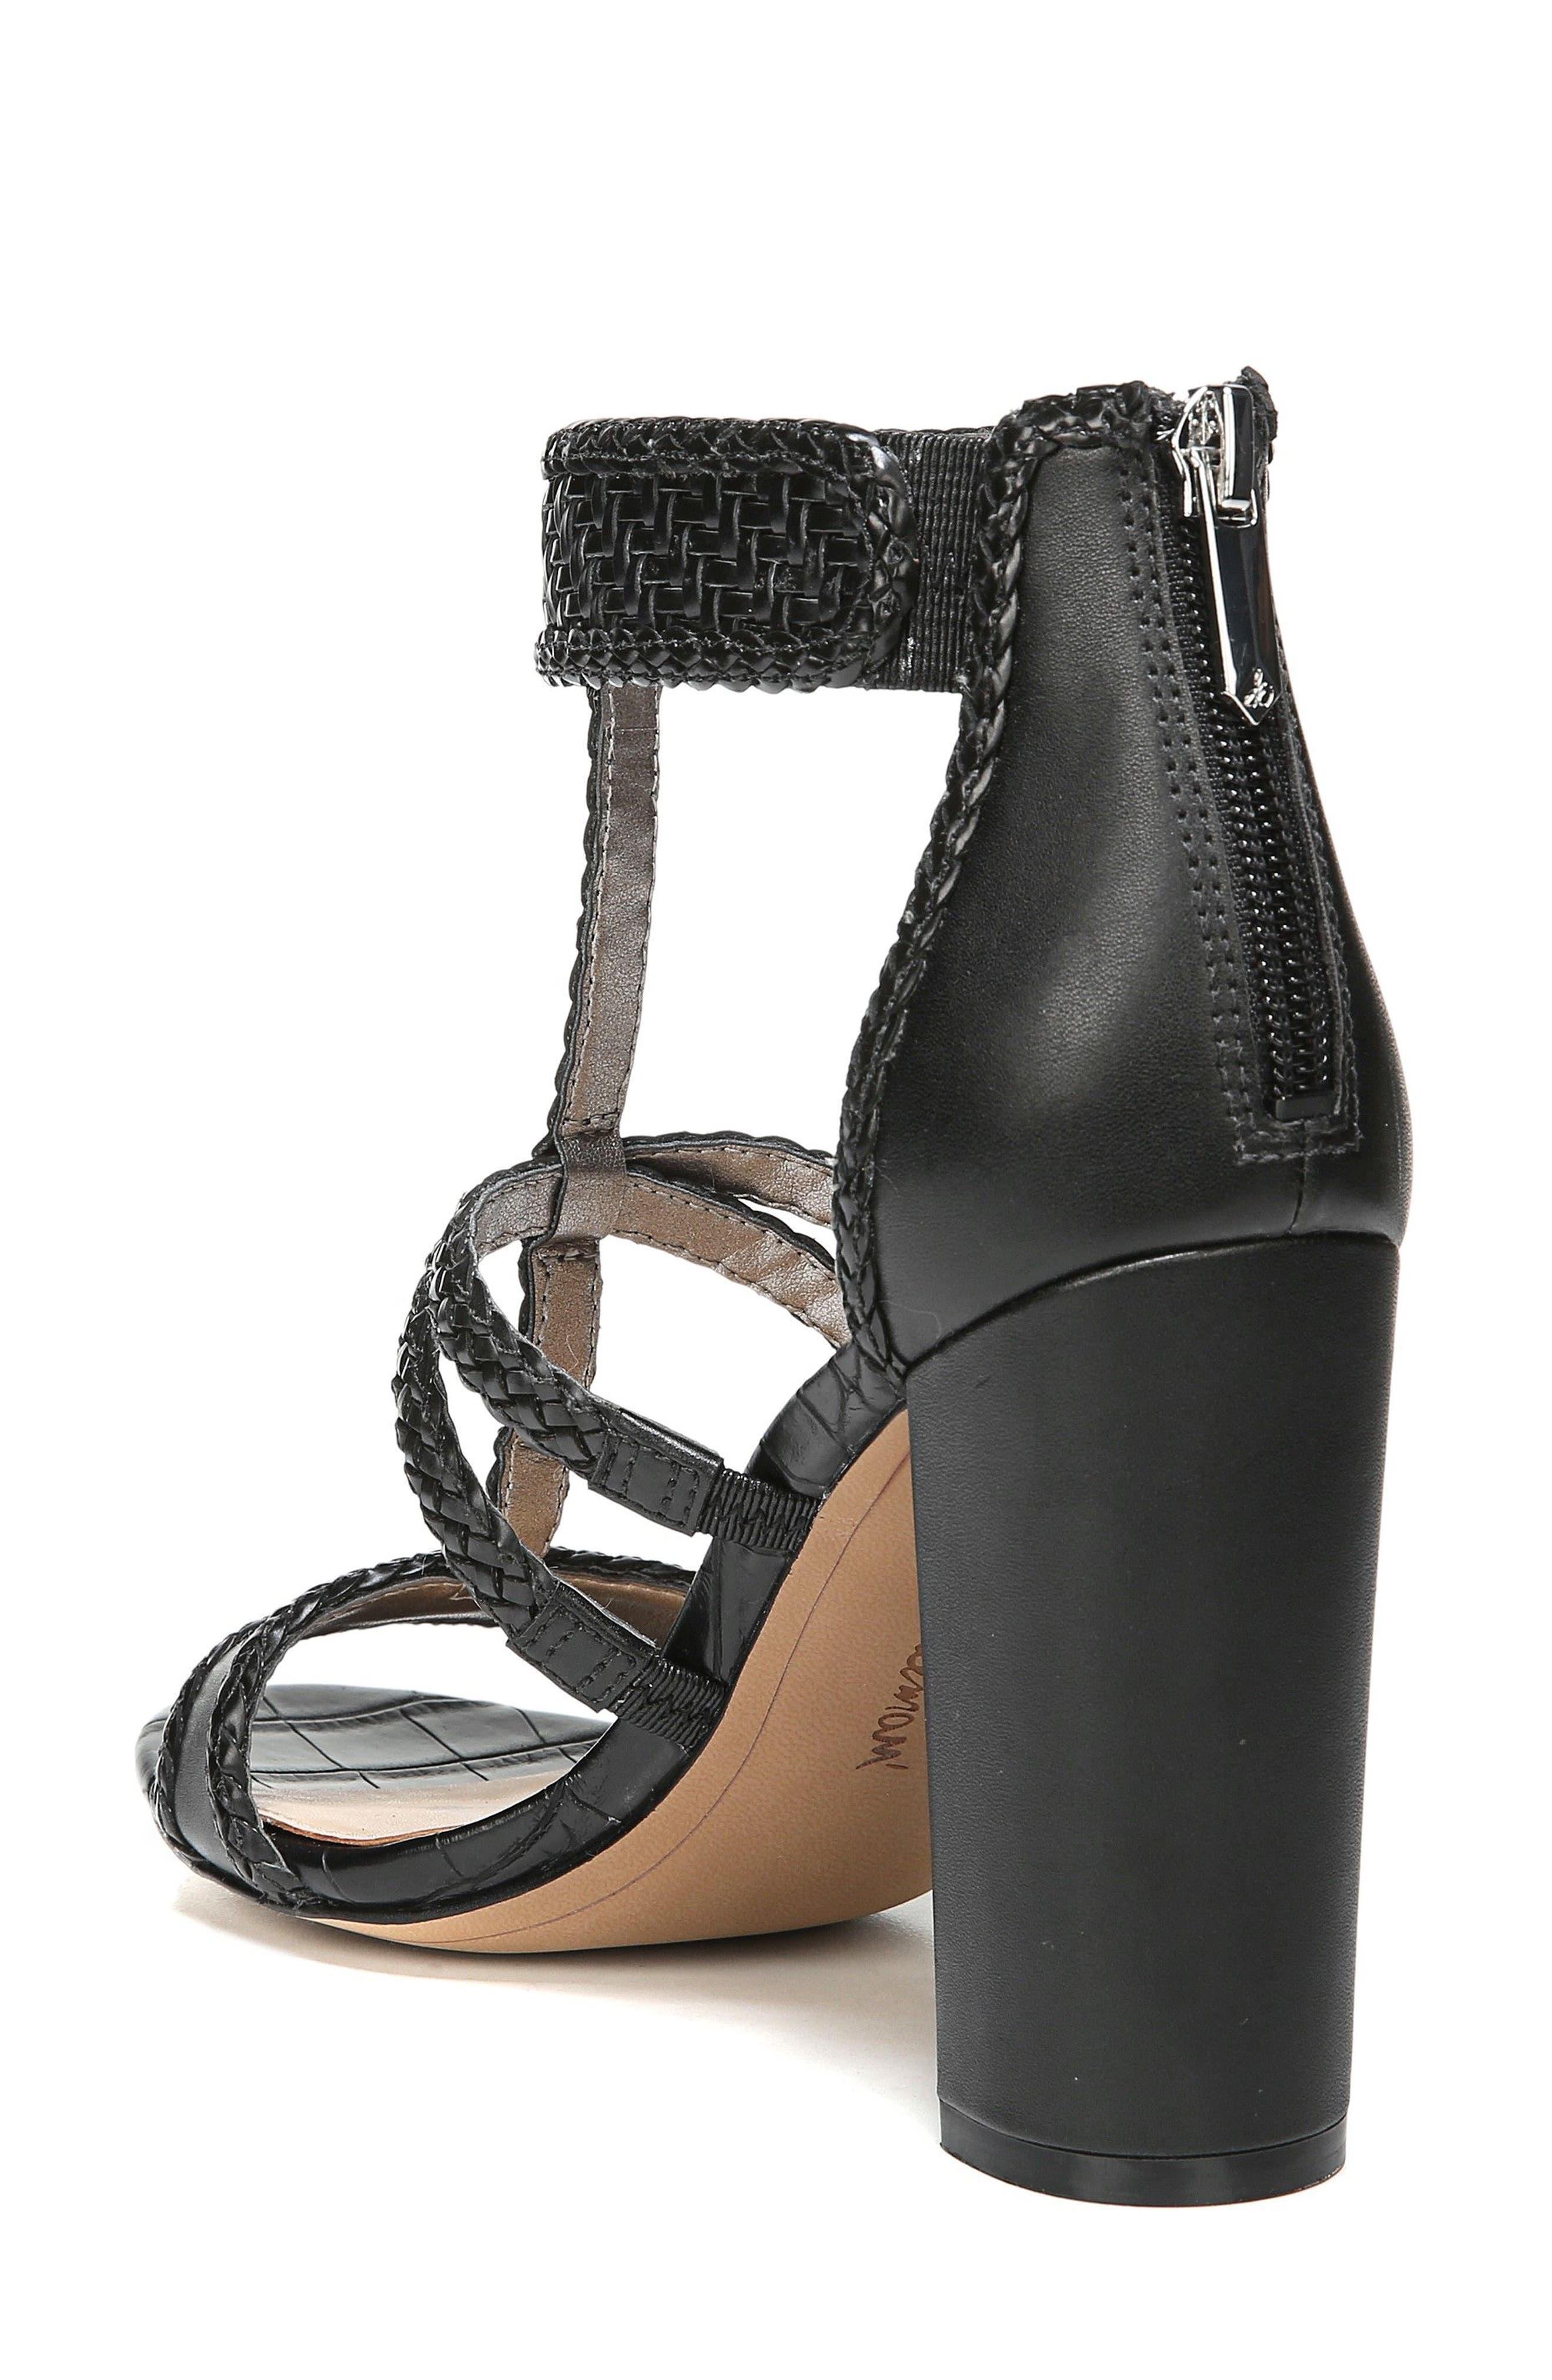 Yordana Woven T-Strap Sandal,                             Alternate thumbnail 2, color,                             001